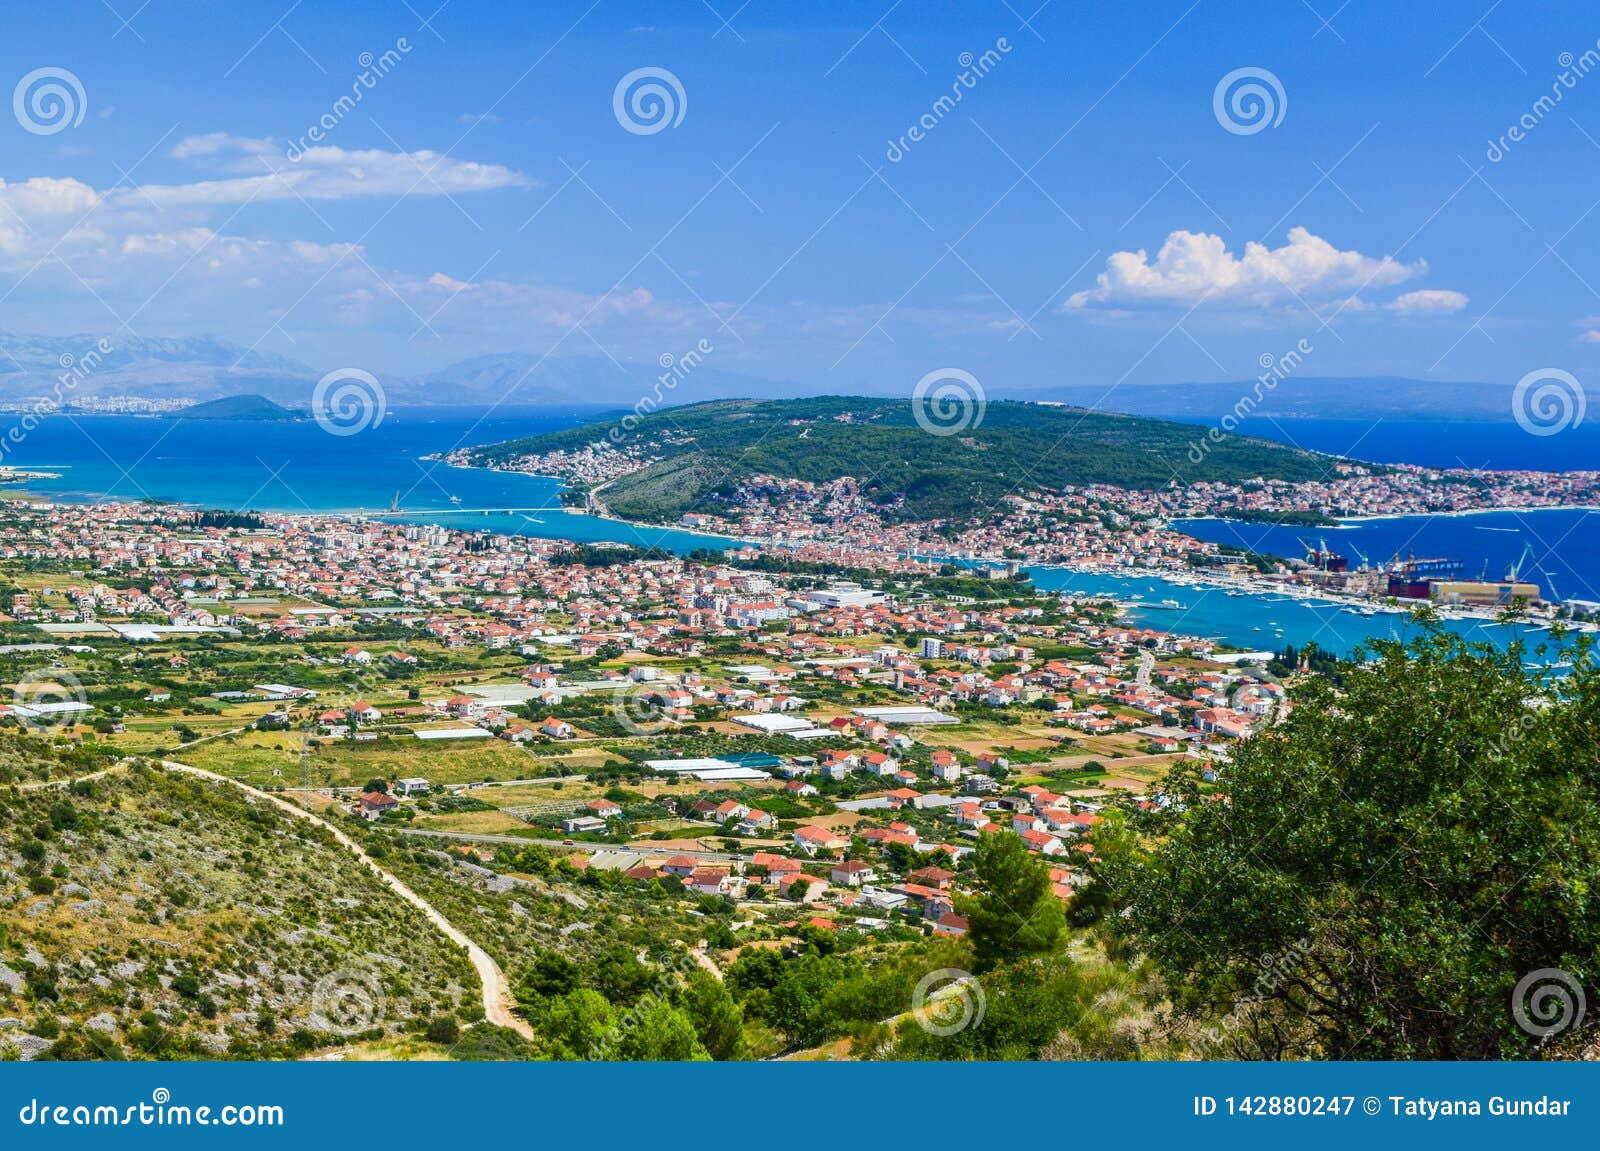 The cityscape Trogir, Croatia